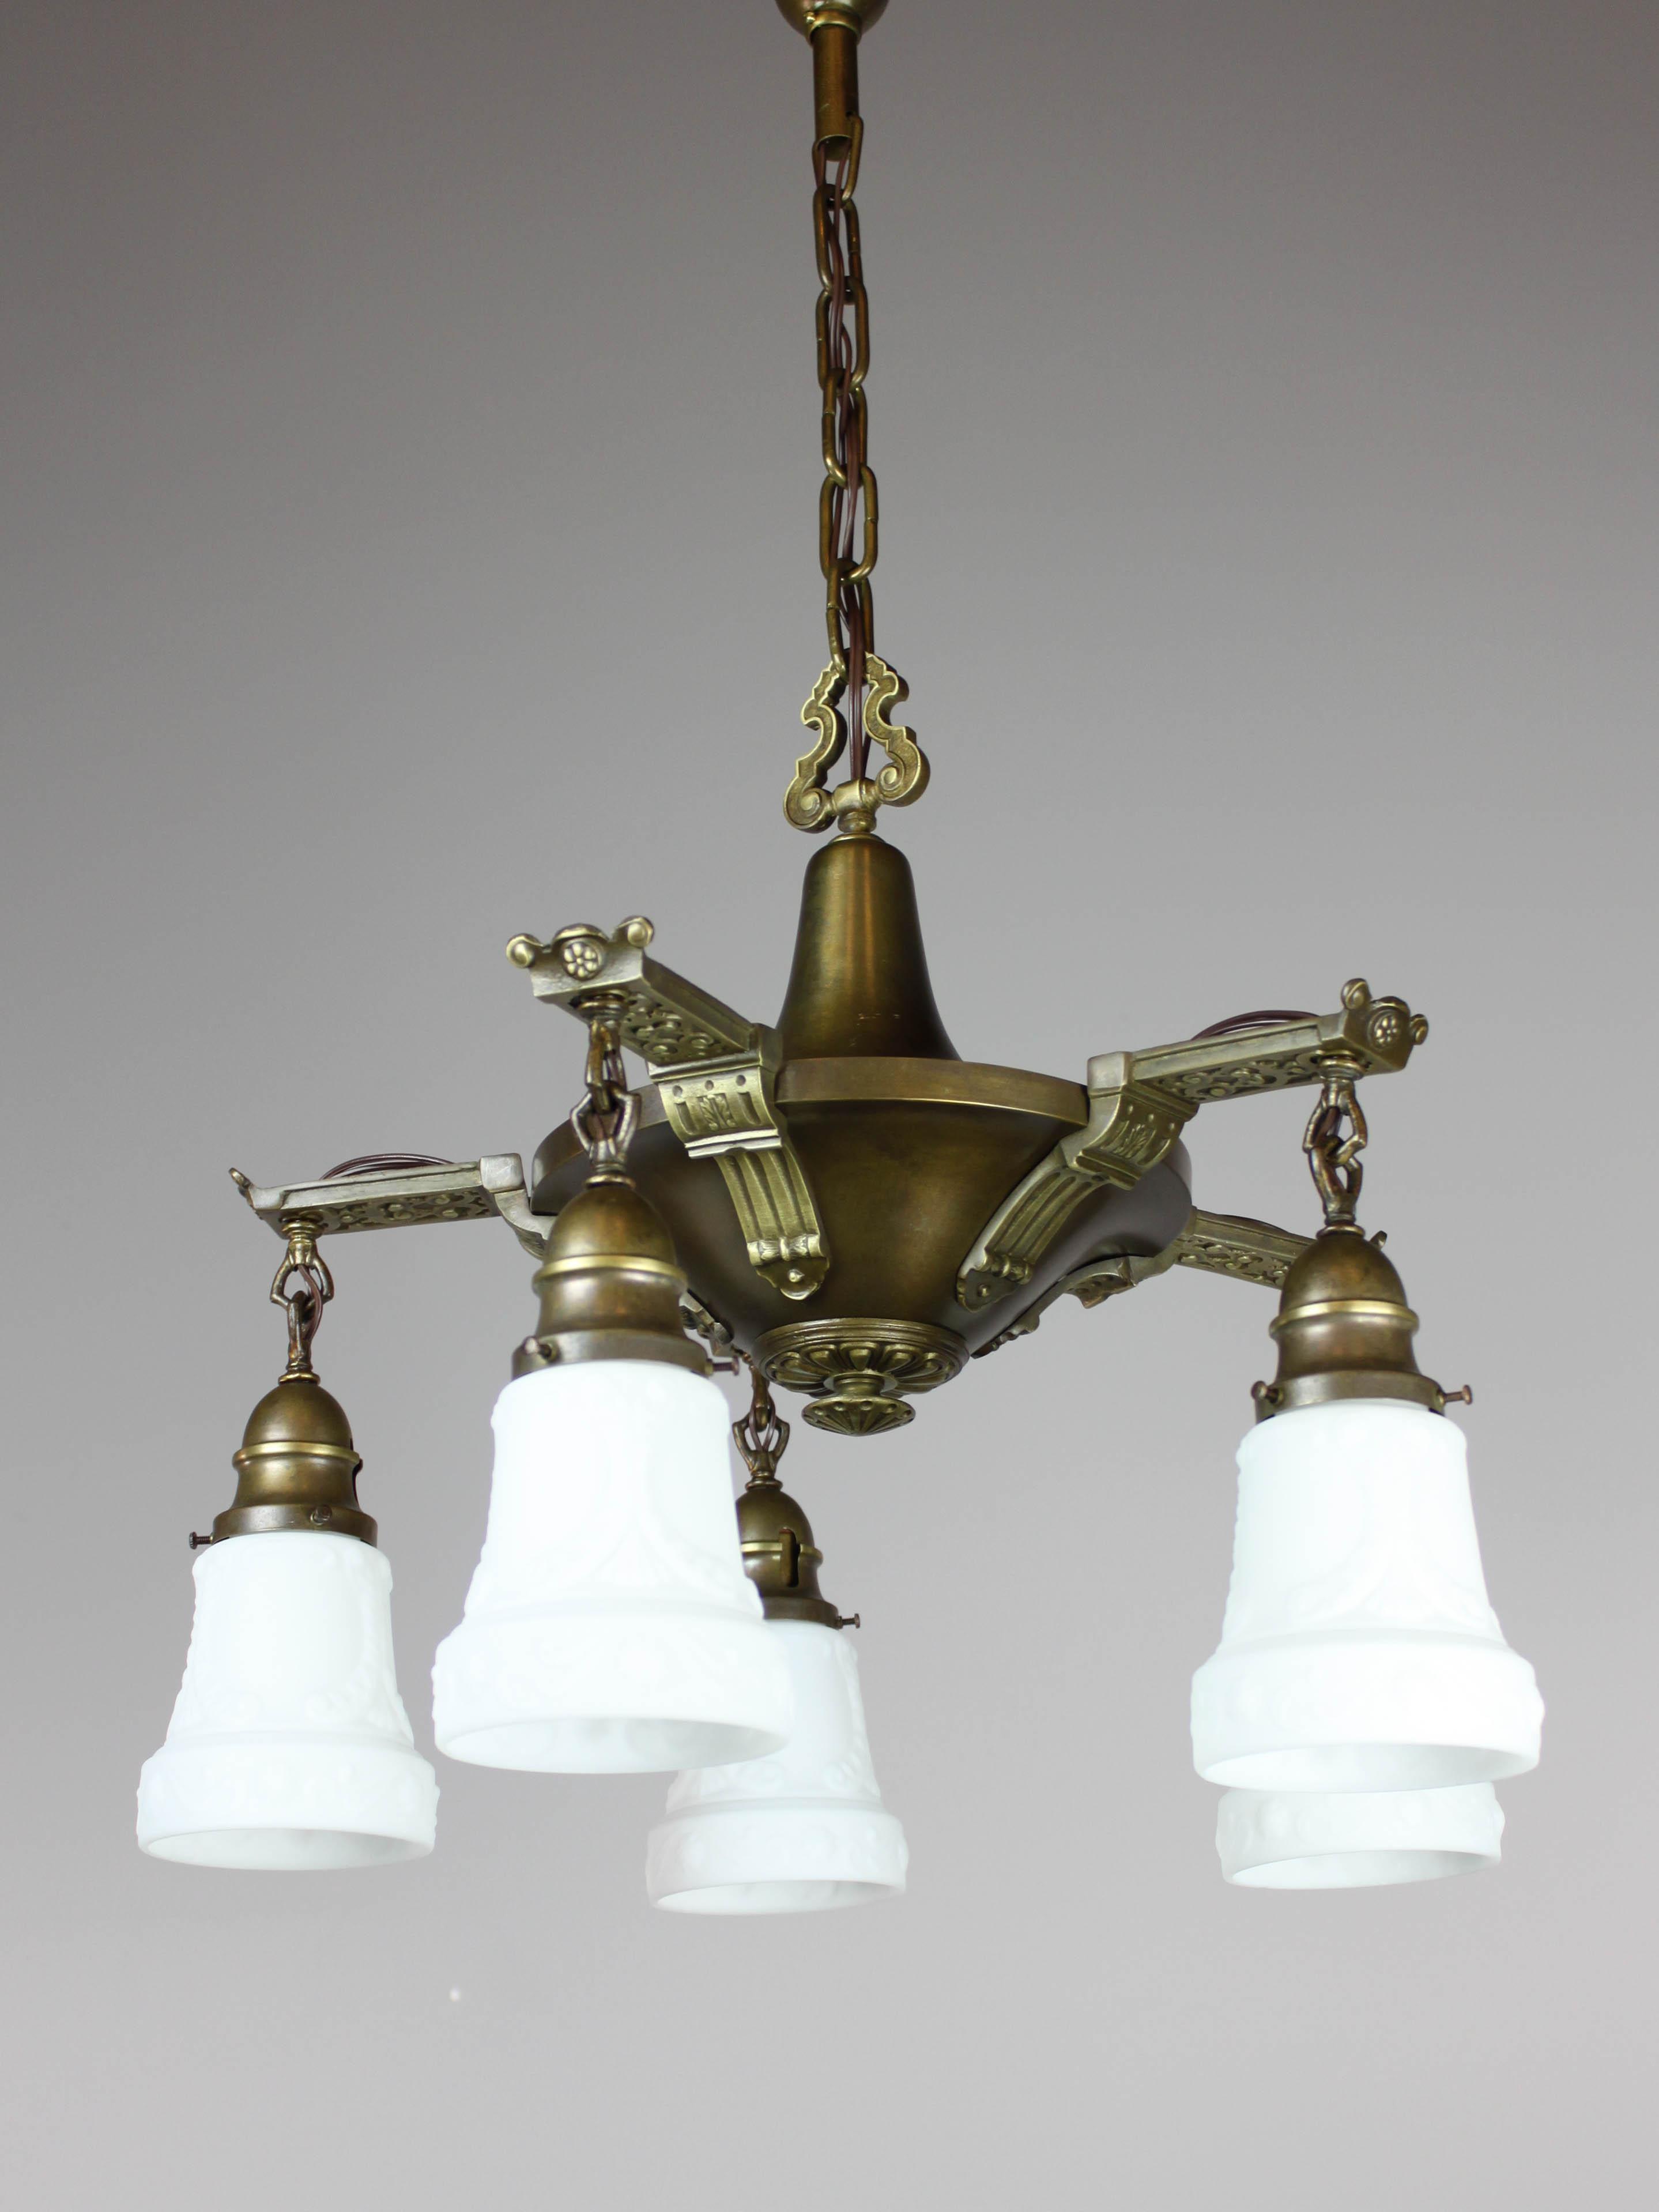 Antique Edwardian Pan Light Fixture 5 Light Renew Gallery